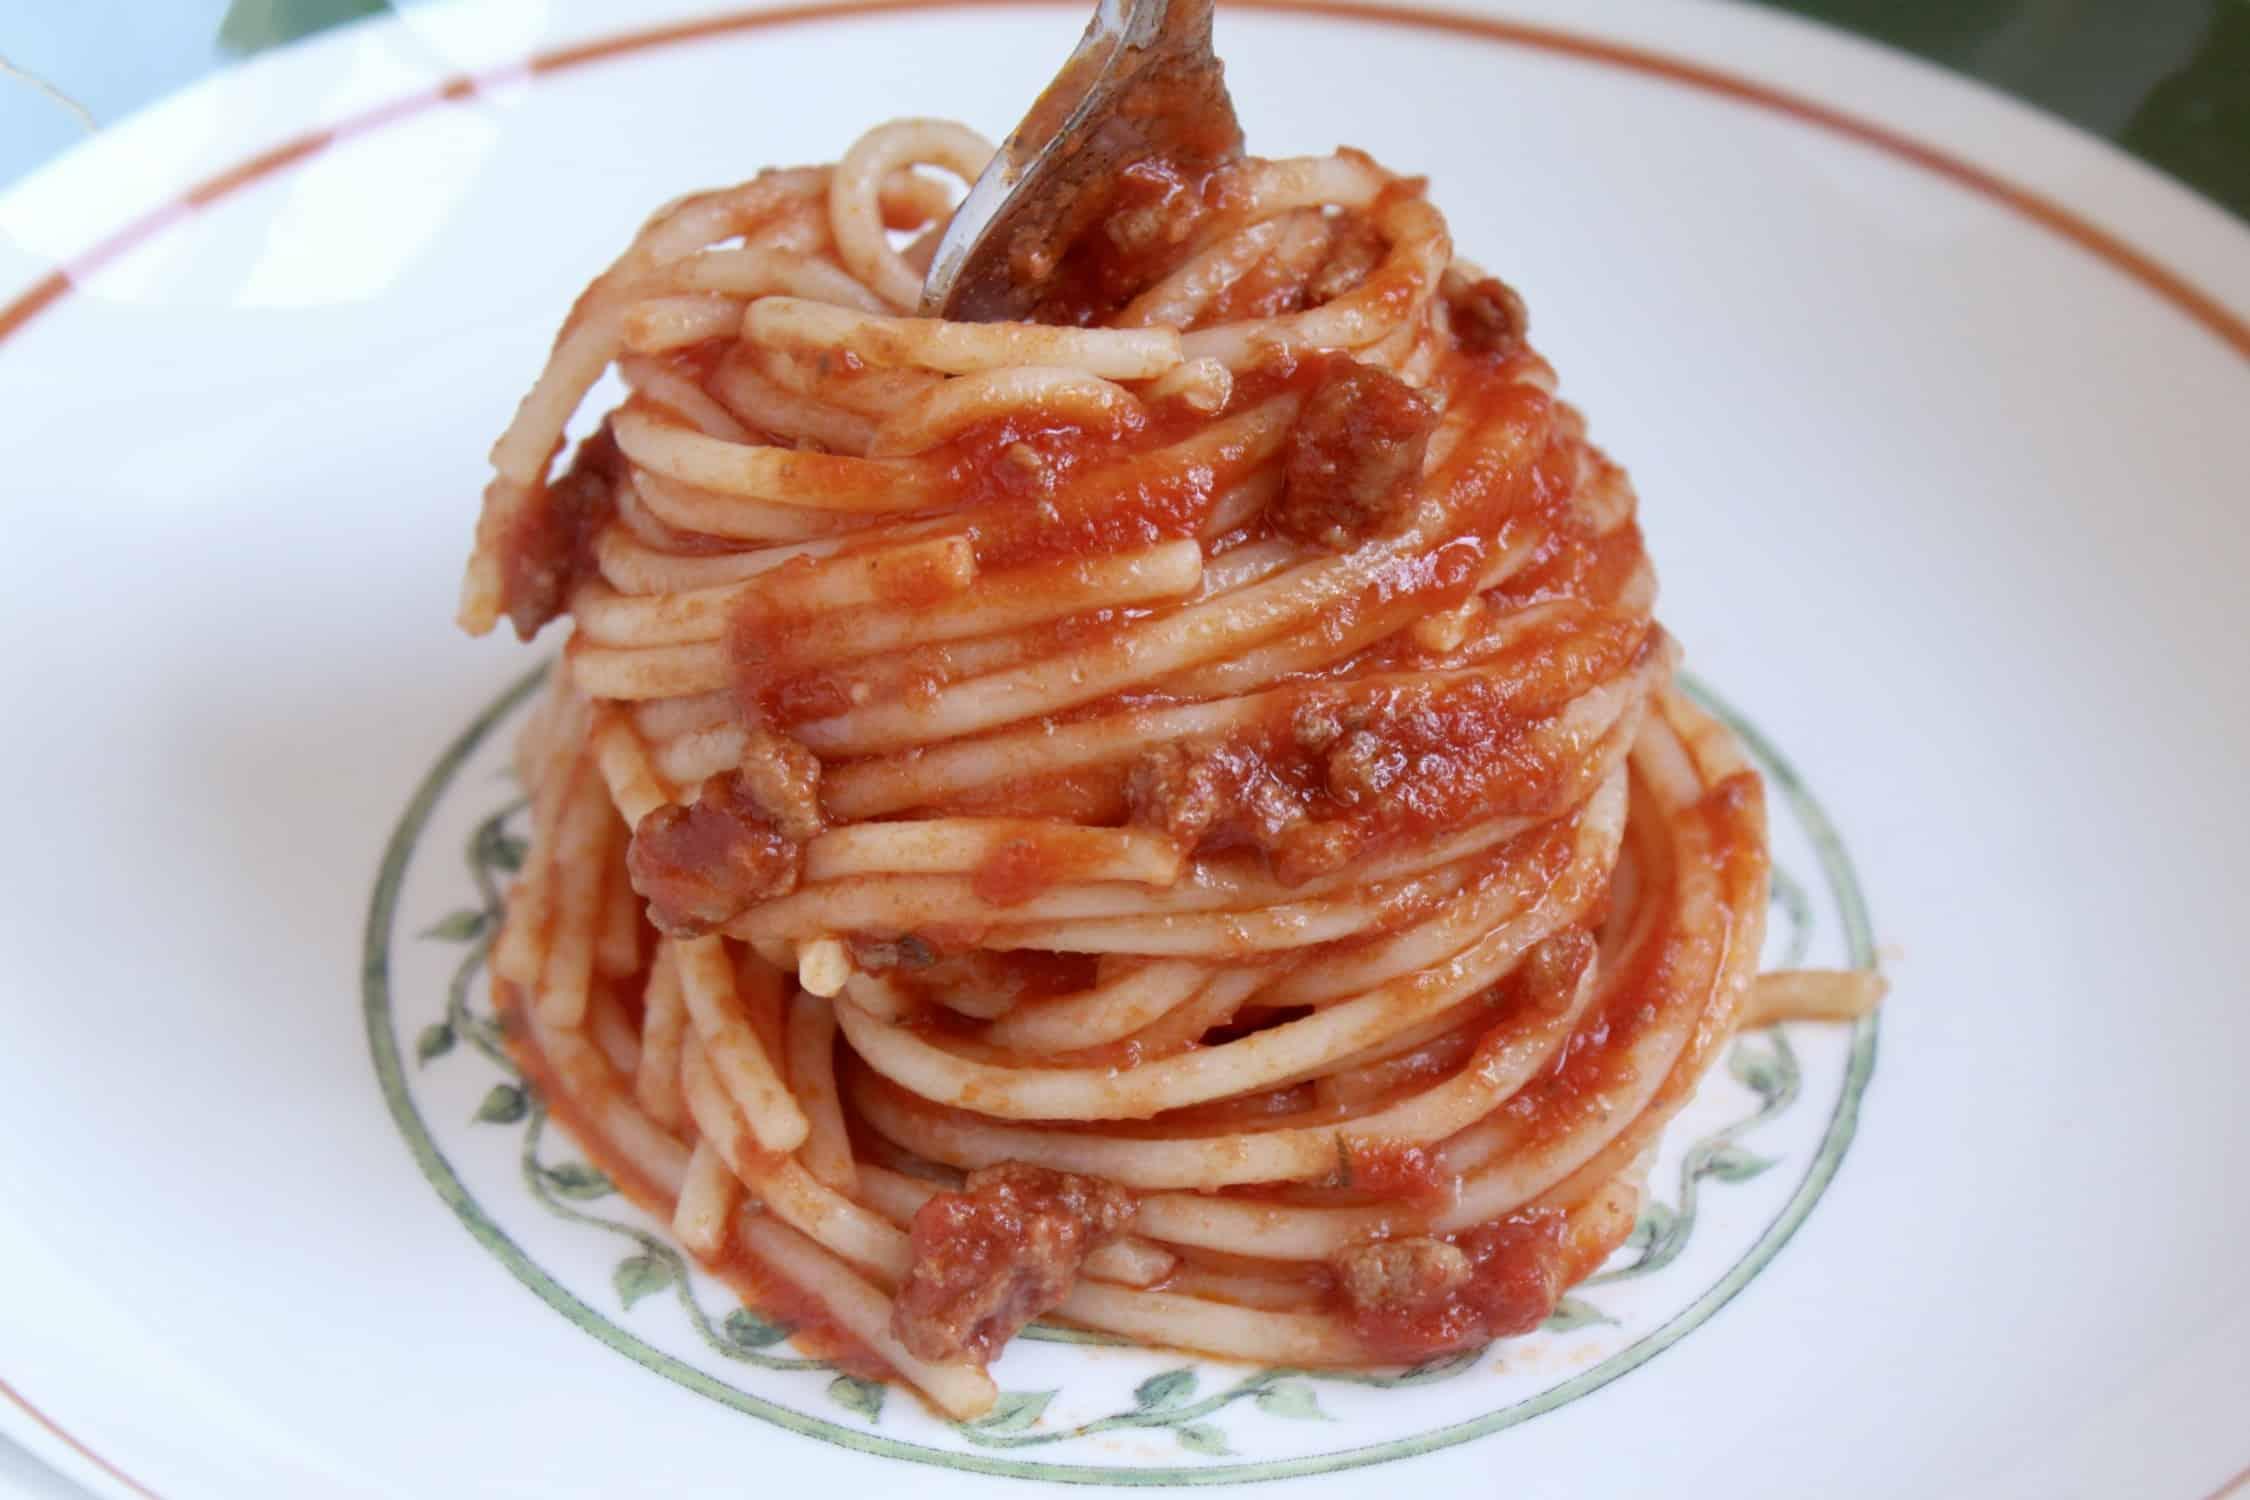 spaghetti served restaurant style